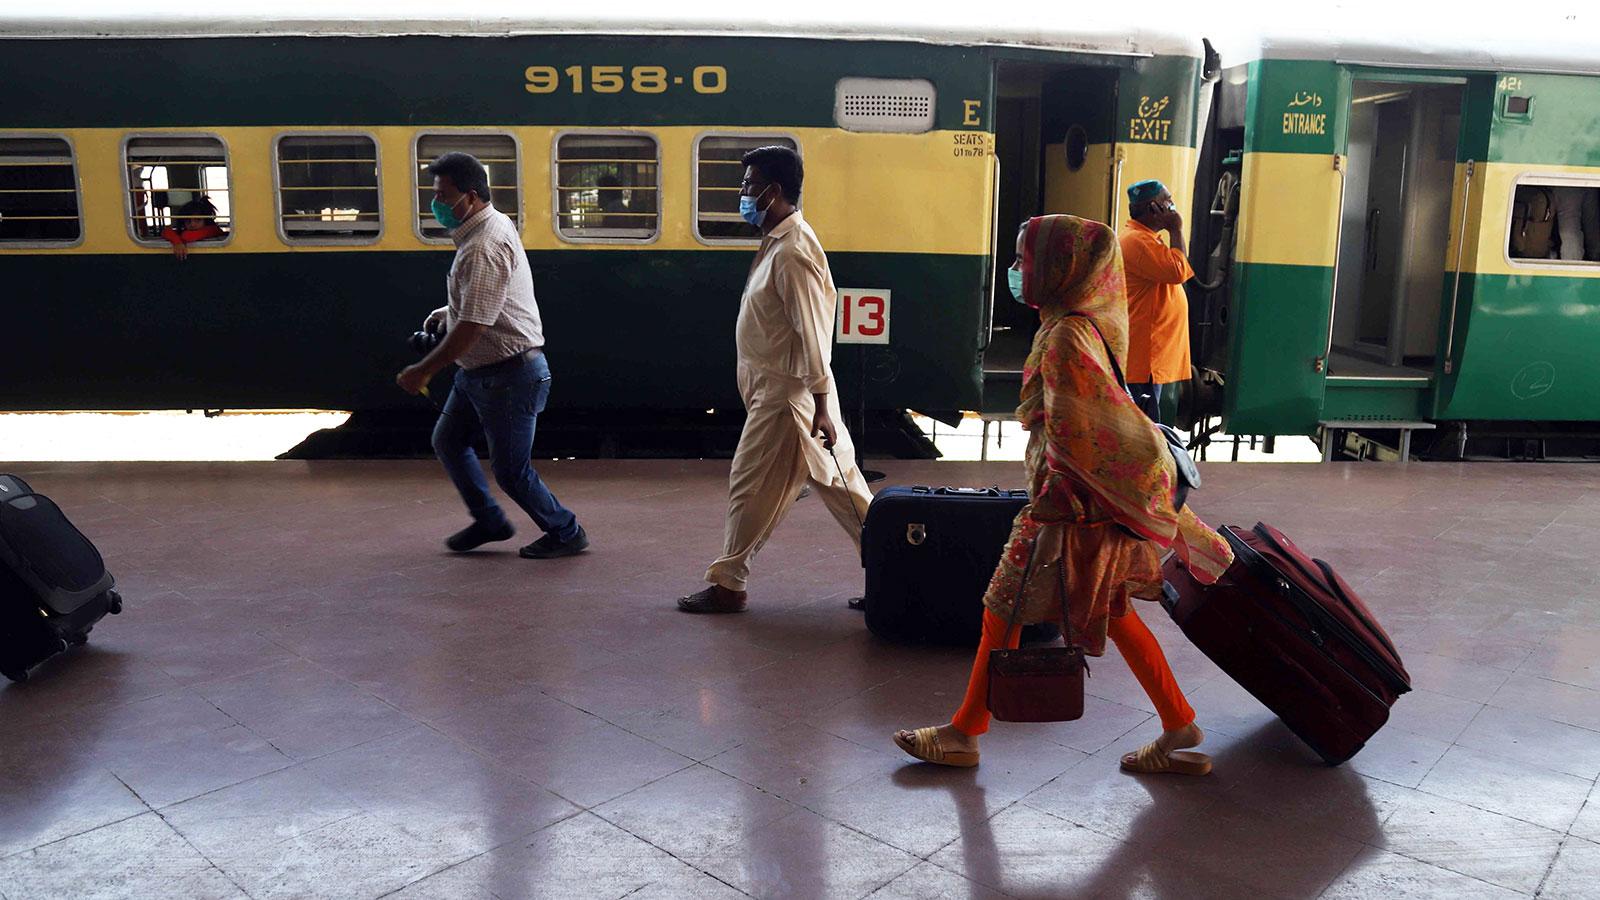 Passengers wearing face masks as a precaution against coronavirus arrive at Rawalpindi railway station in Pakistan on Wednesday.